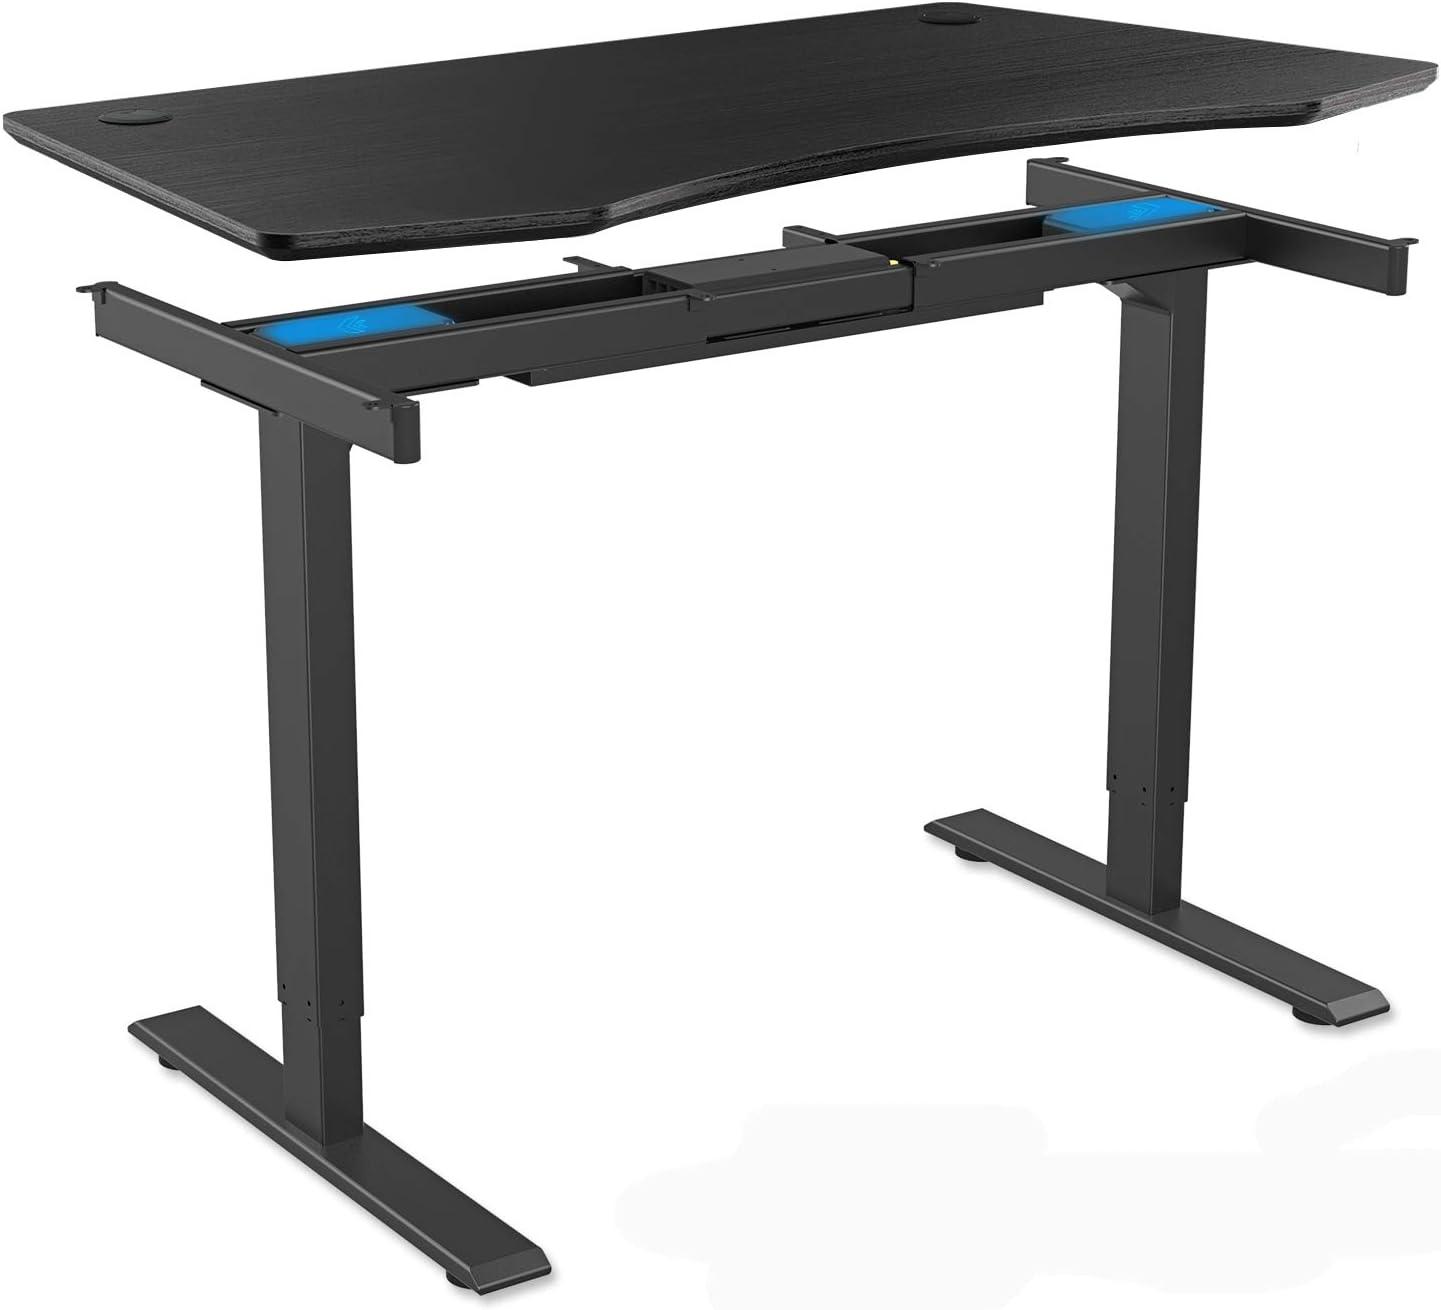 Office Standing Desk Adjustable 140 Computer 55.1